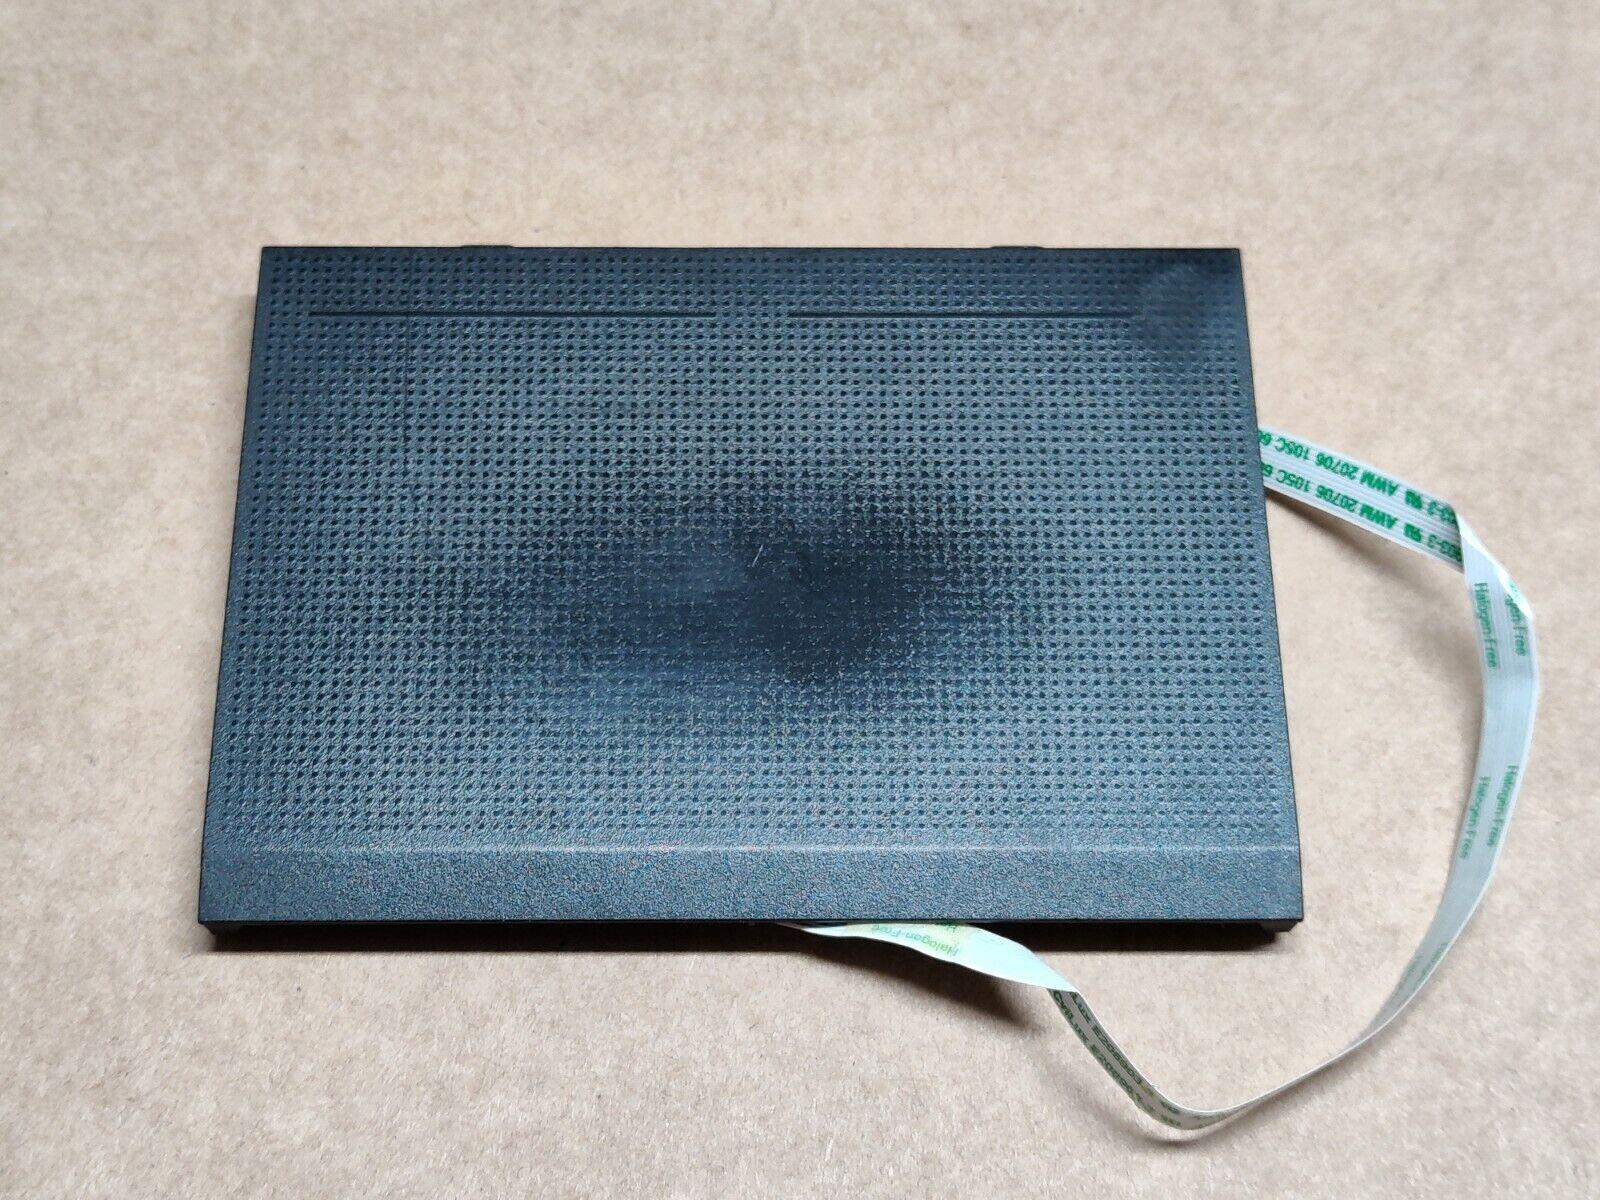 ✔️ Lenovo ThinkPad E530 Touchpad TM-01719-002 HT21320 920-001912 TM1719